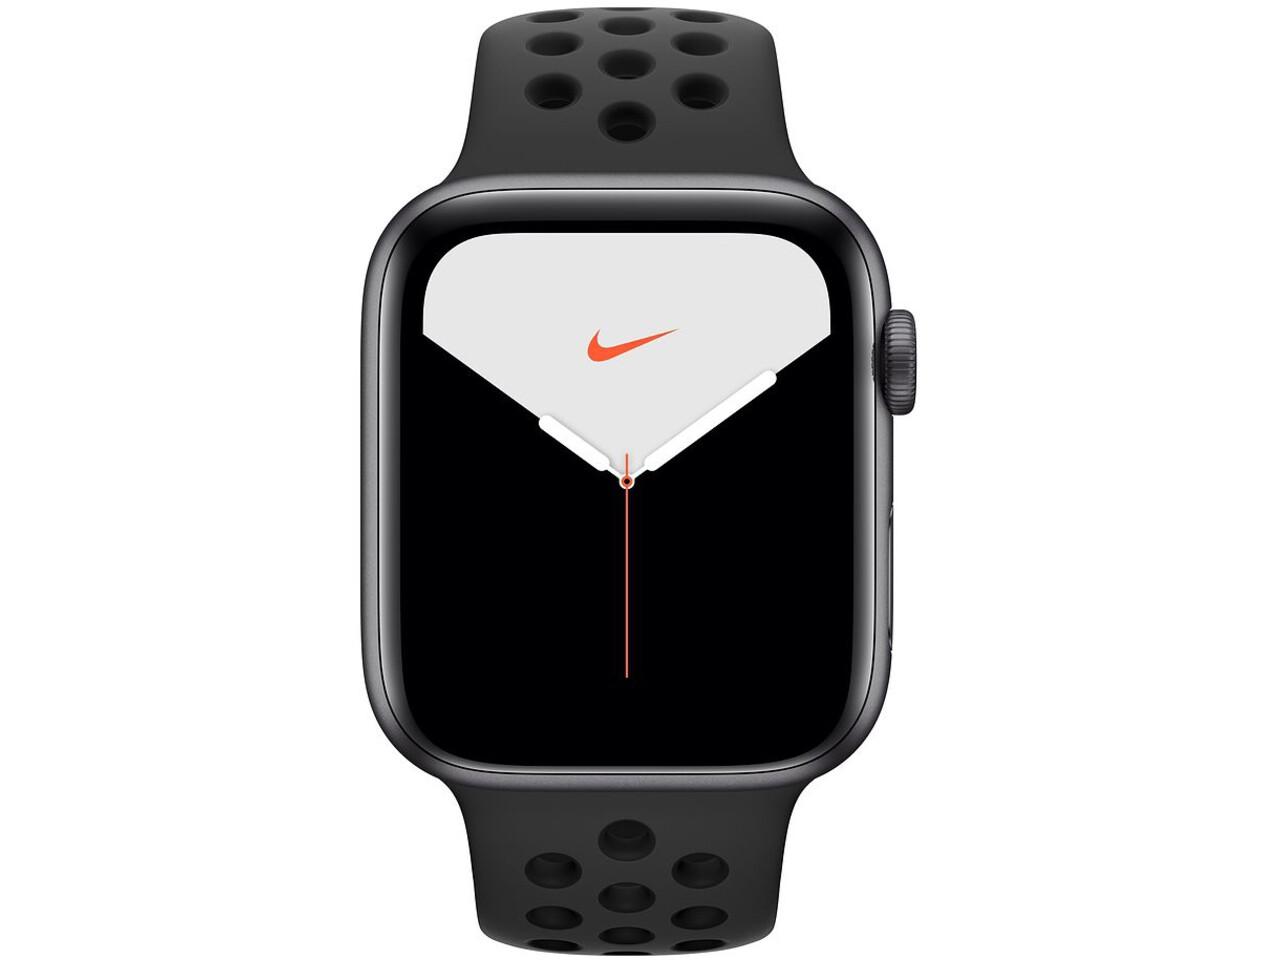 apple watch nike series 5 44mm space gray aluminum anthraciteblack nike sport band